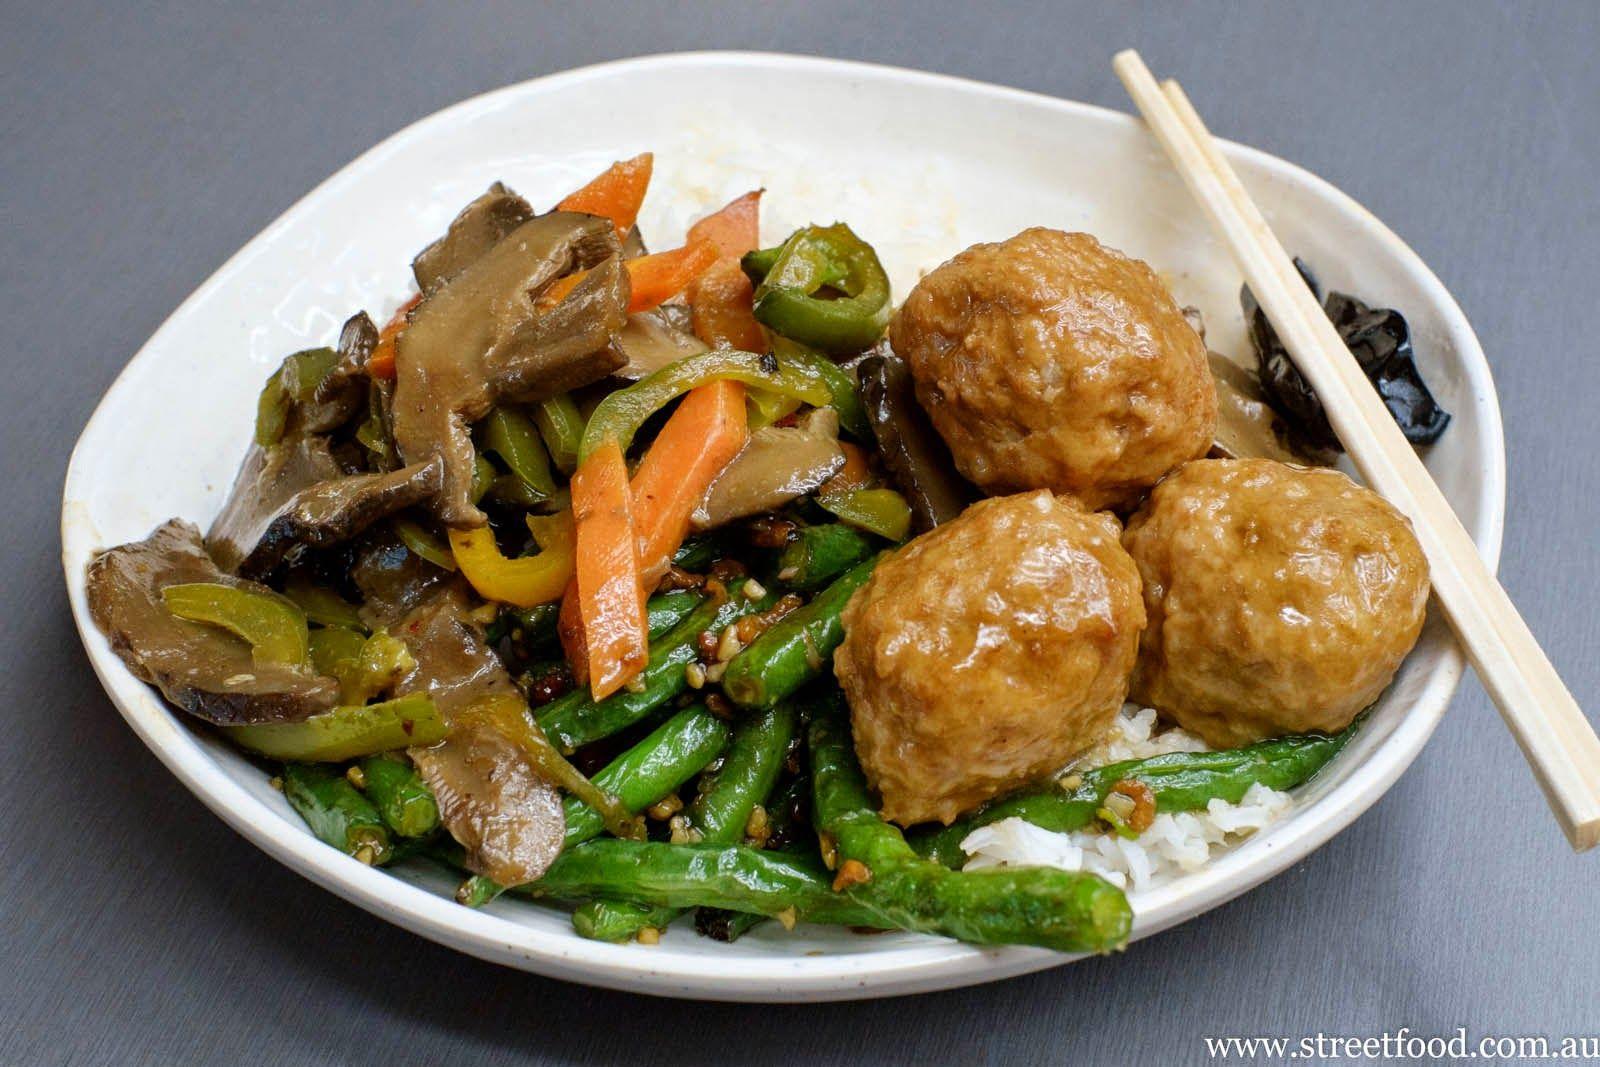 B Kyu Zhou Mum Cafe Chinese Dixon House Food Court Chinatown Food Sydney Food Food Court